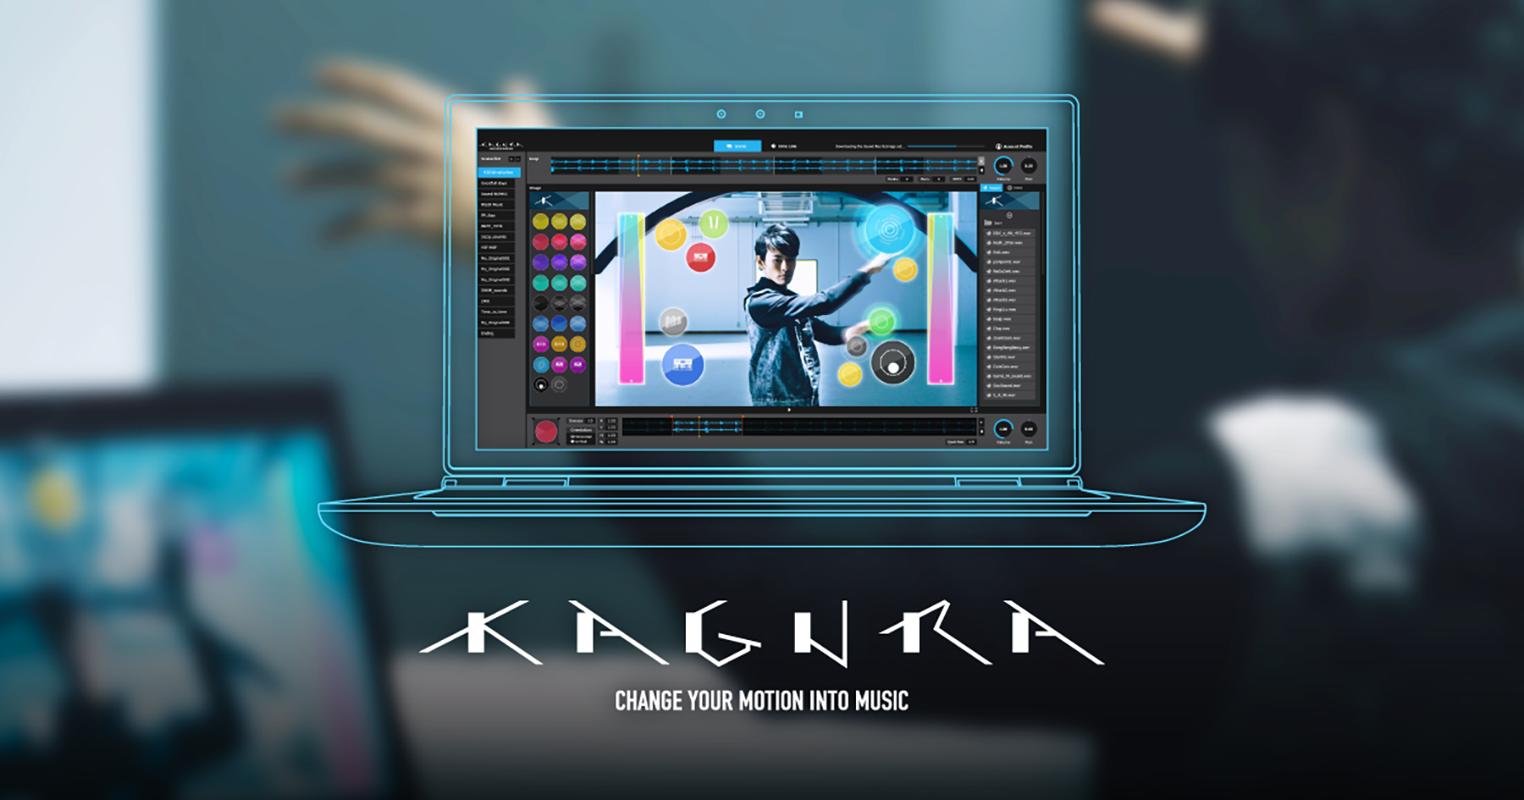 KAGURA - CHANGE YOUR MOTION INTO MUSIC